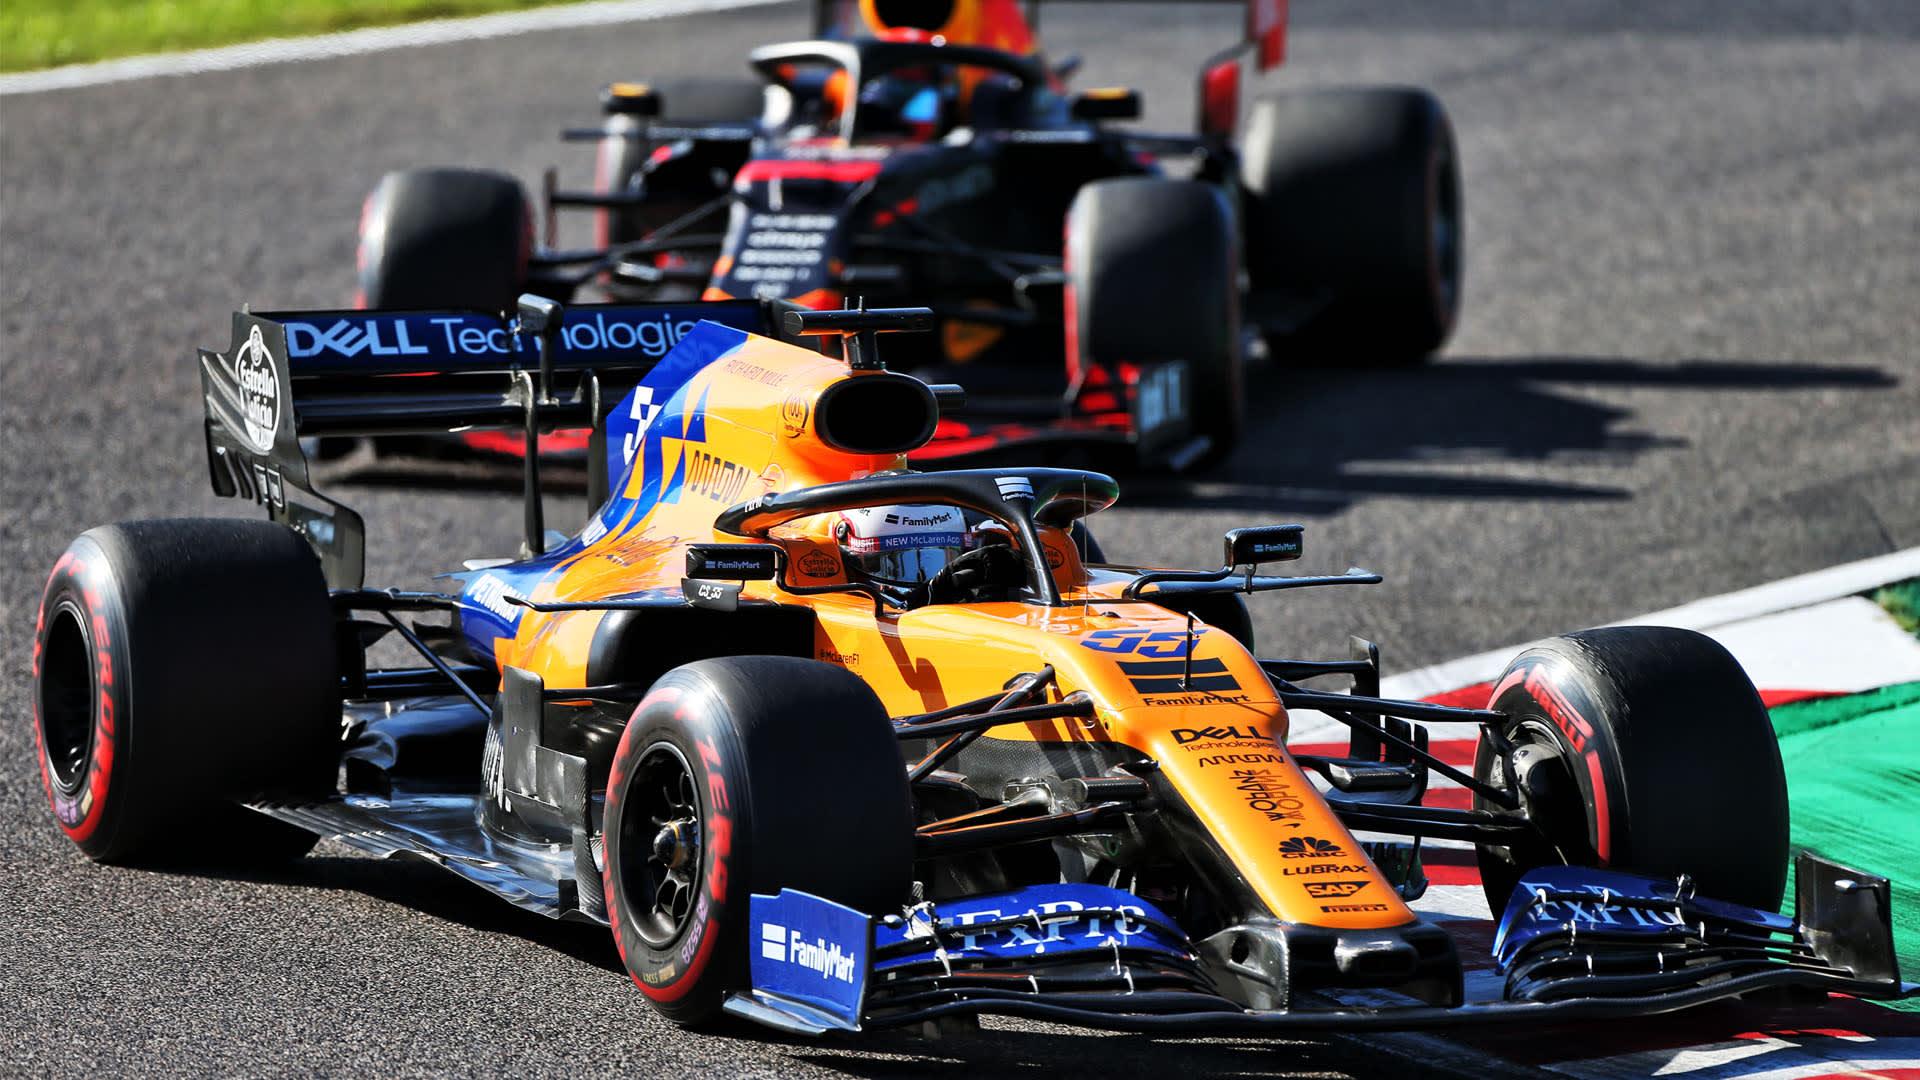 Japanese Grand Prix 2019 Sainz Celebrates Perfect Day In Suzuka After Finishing Fifth Formula 1